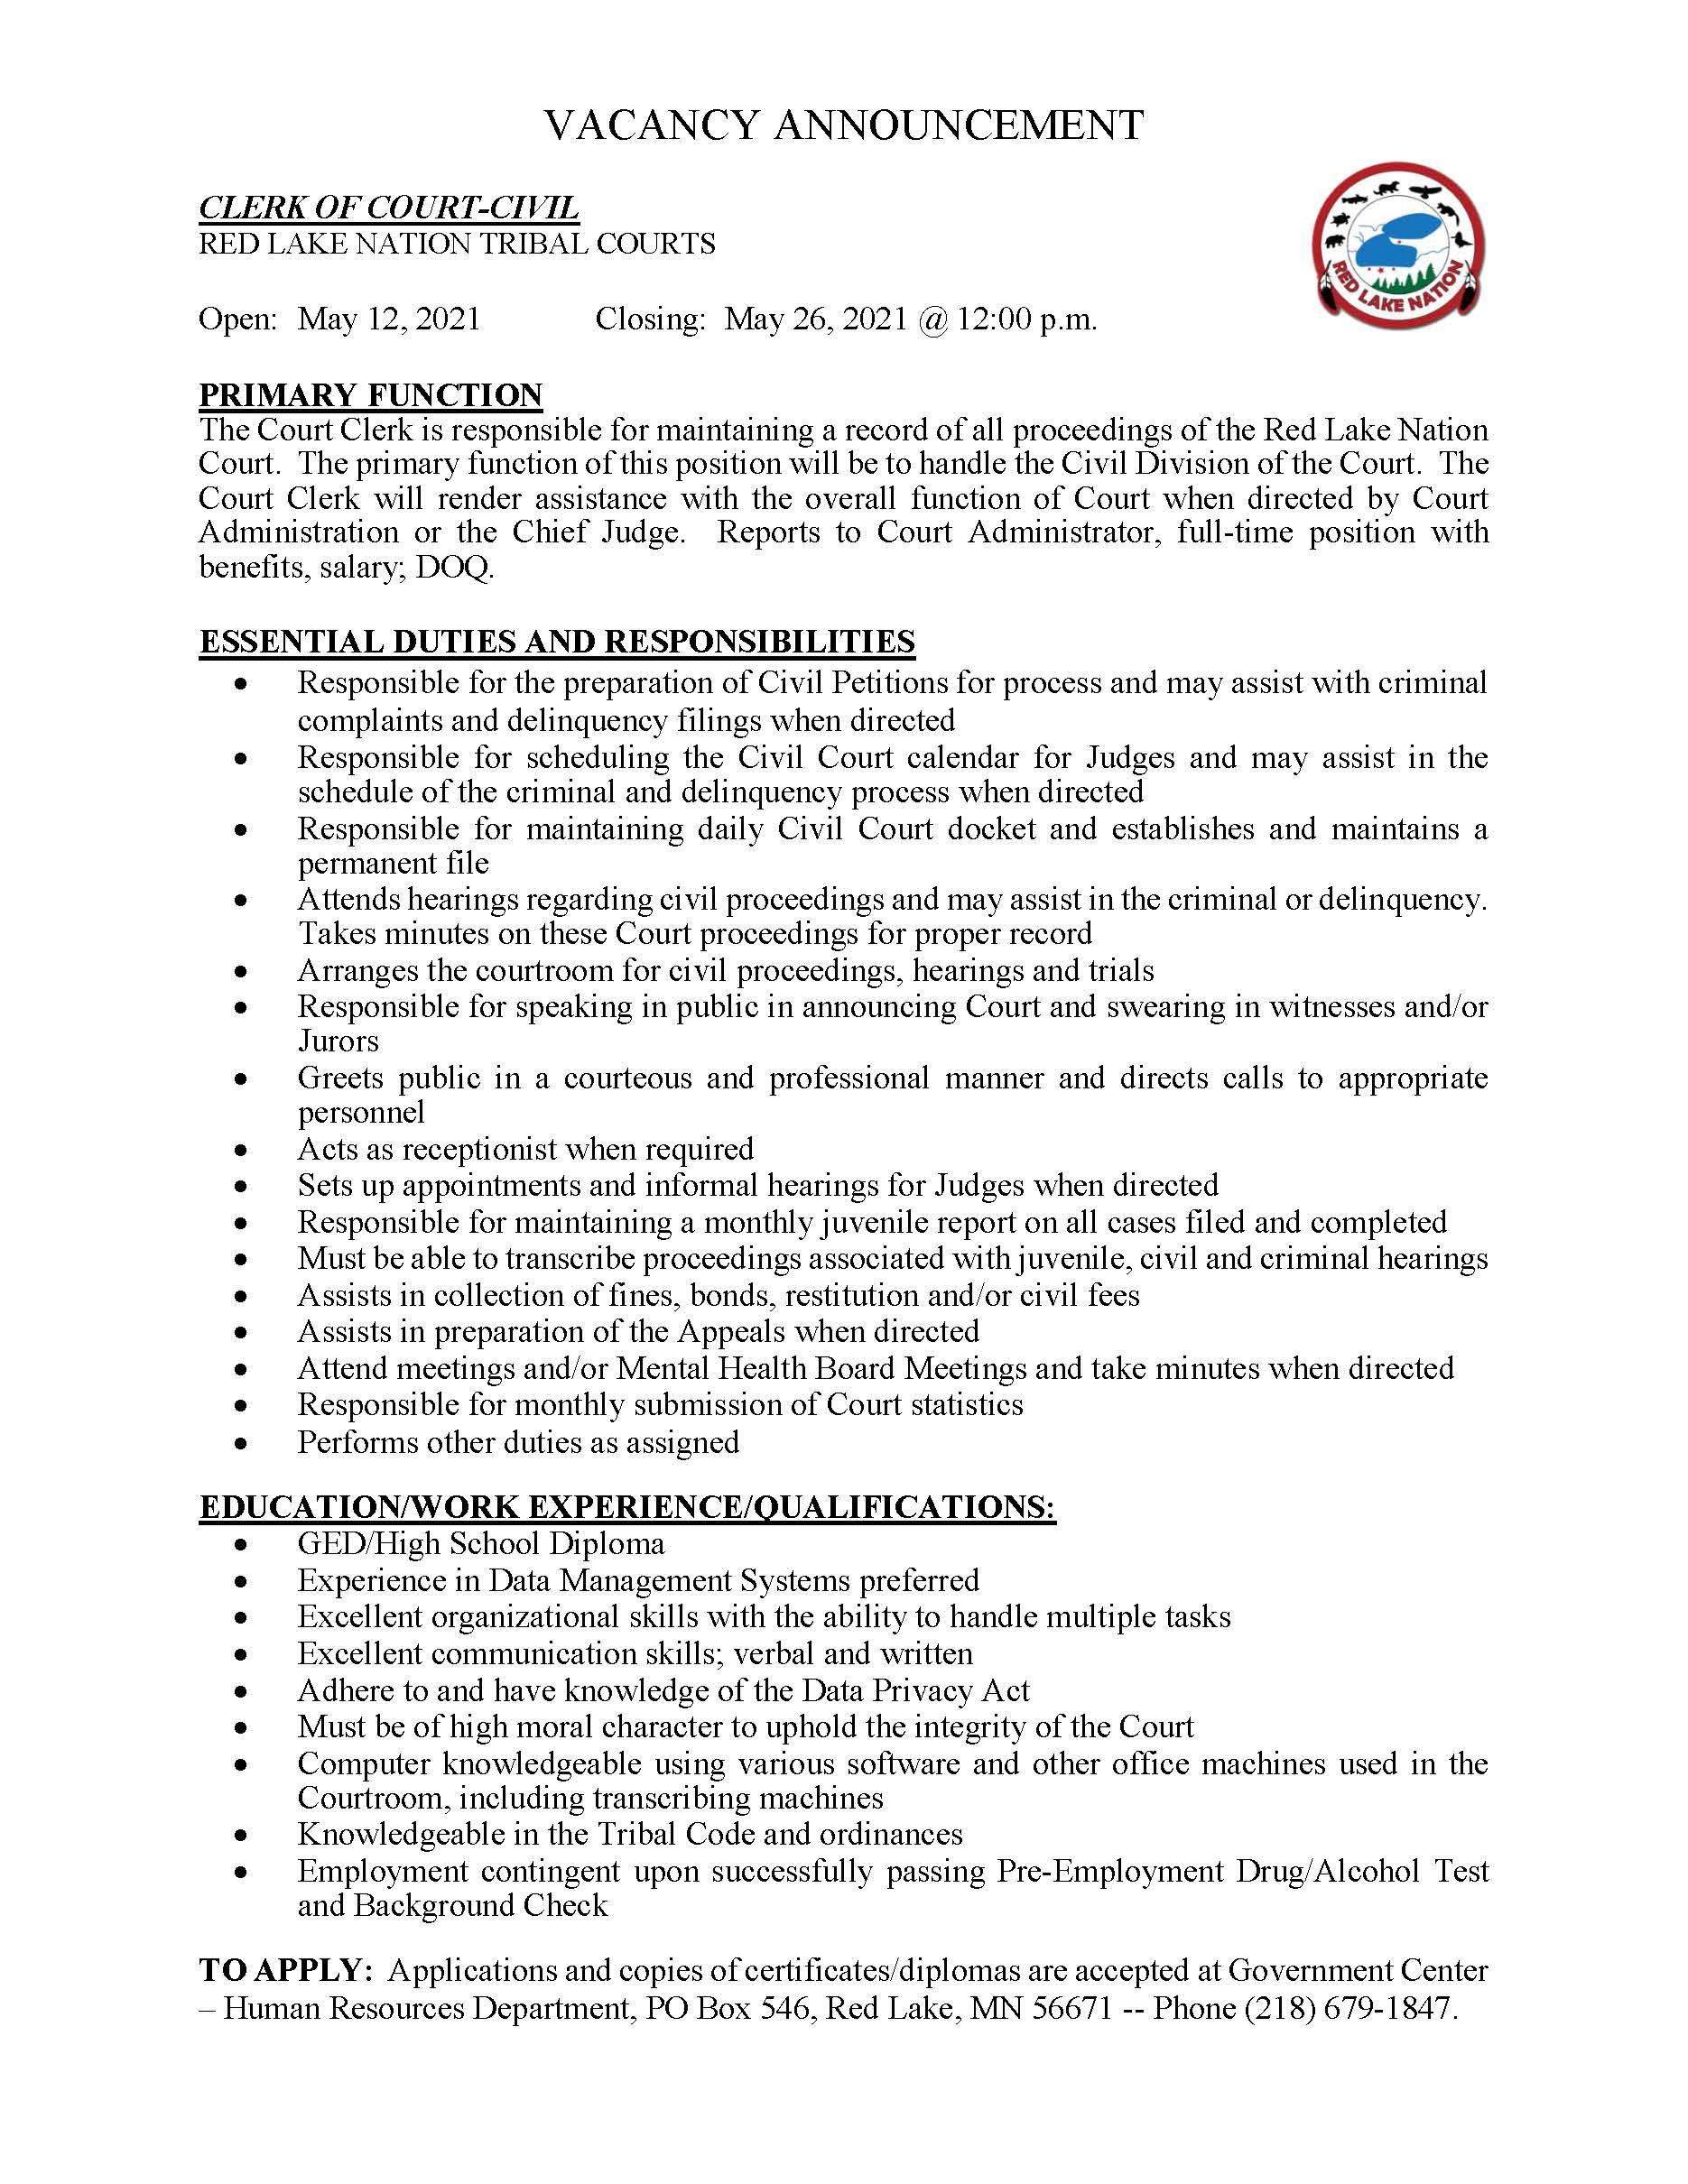 Clerk of Court Civil-Tribal Courts Job Posting 5-11-2021